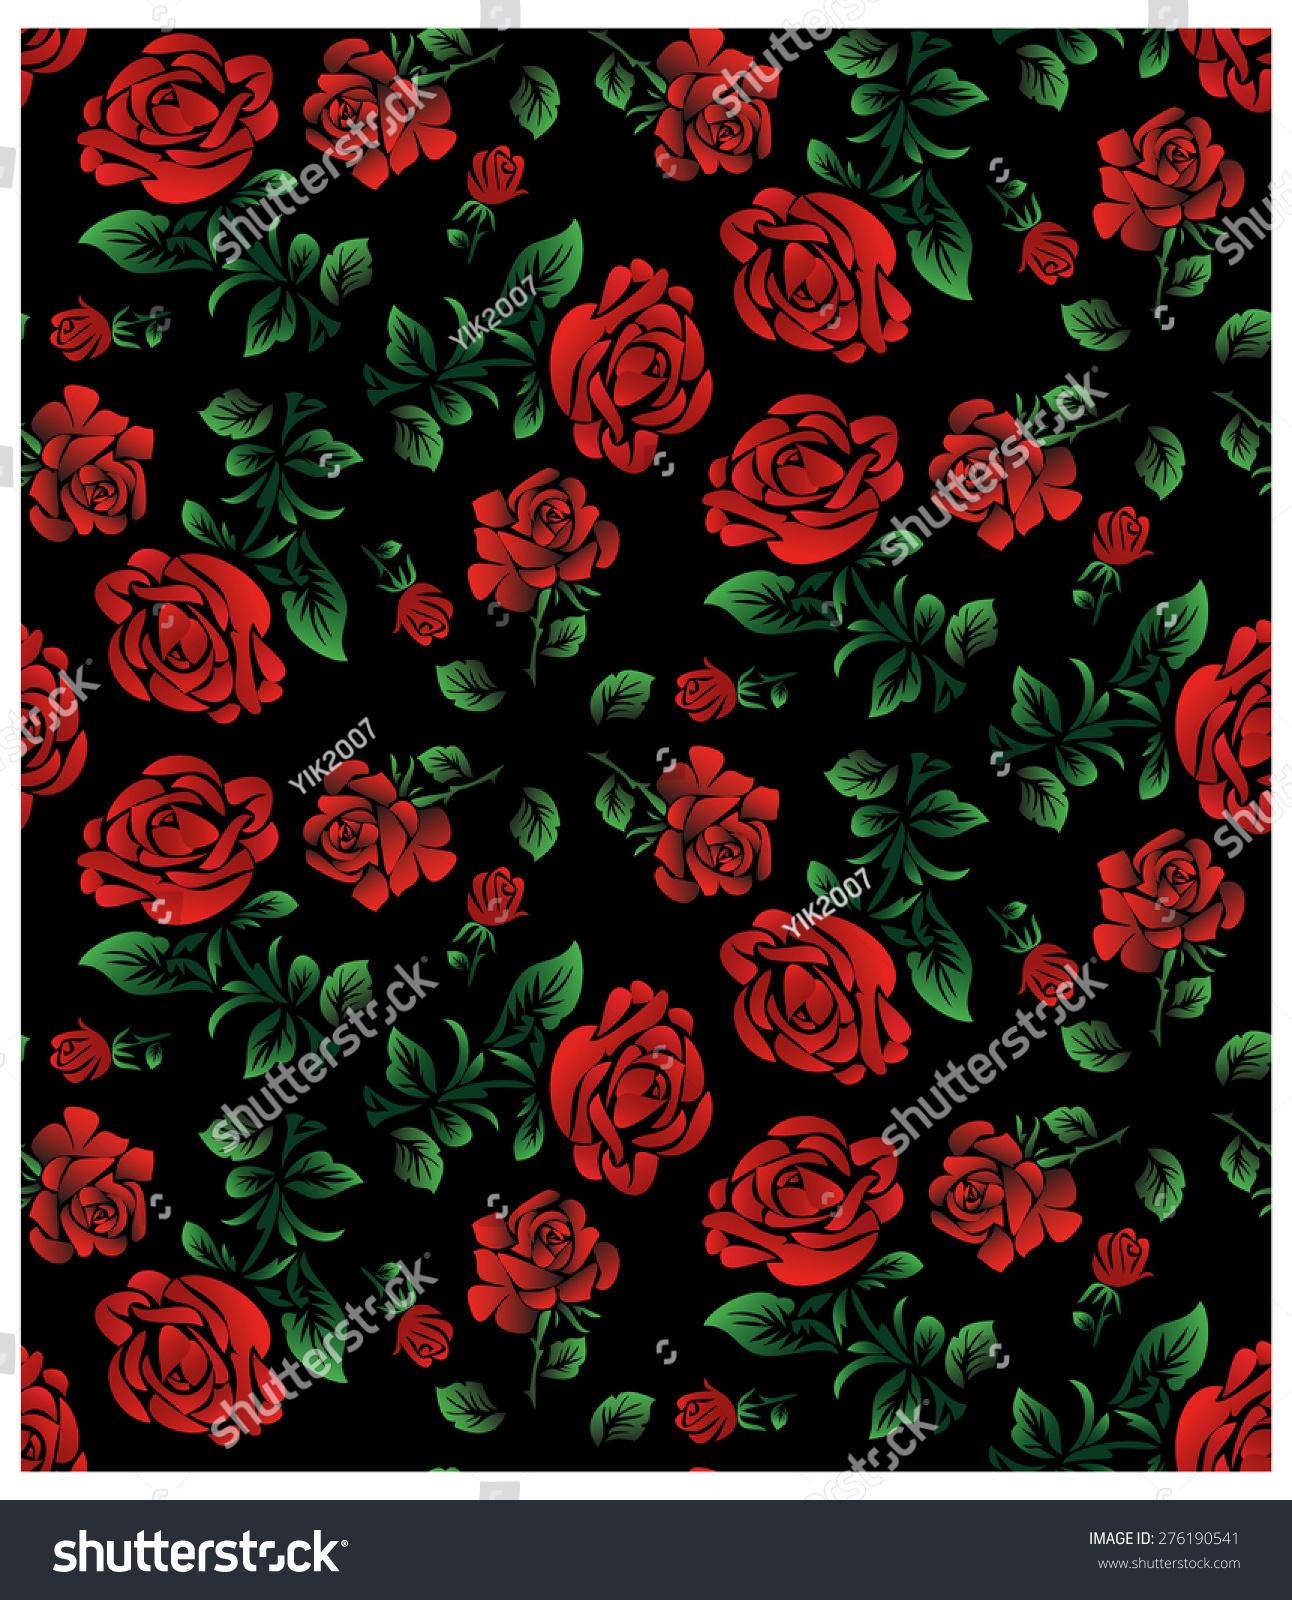 Image Floral Pattern Wallpaper Textile Red Roses Stock Illustration